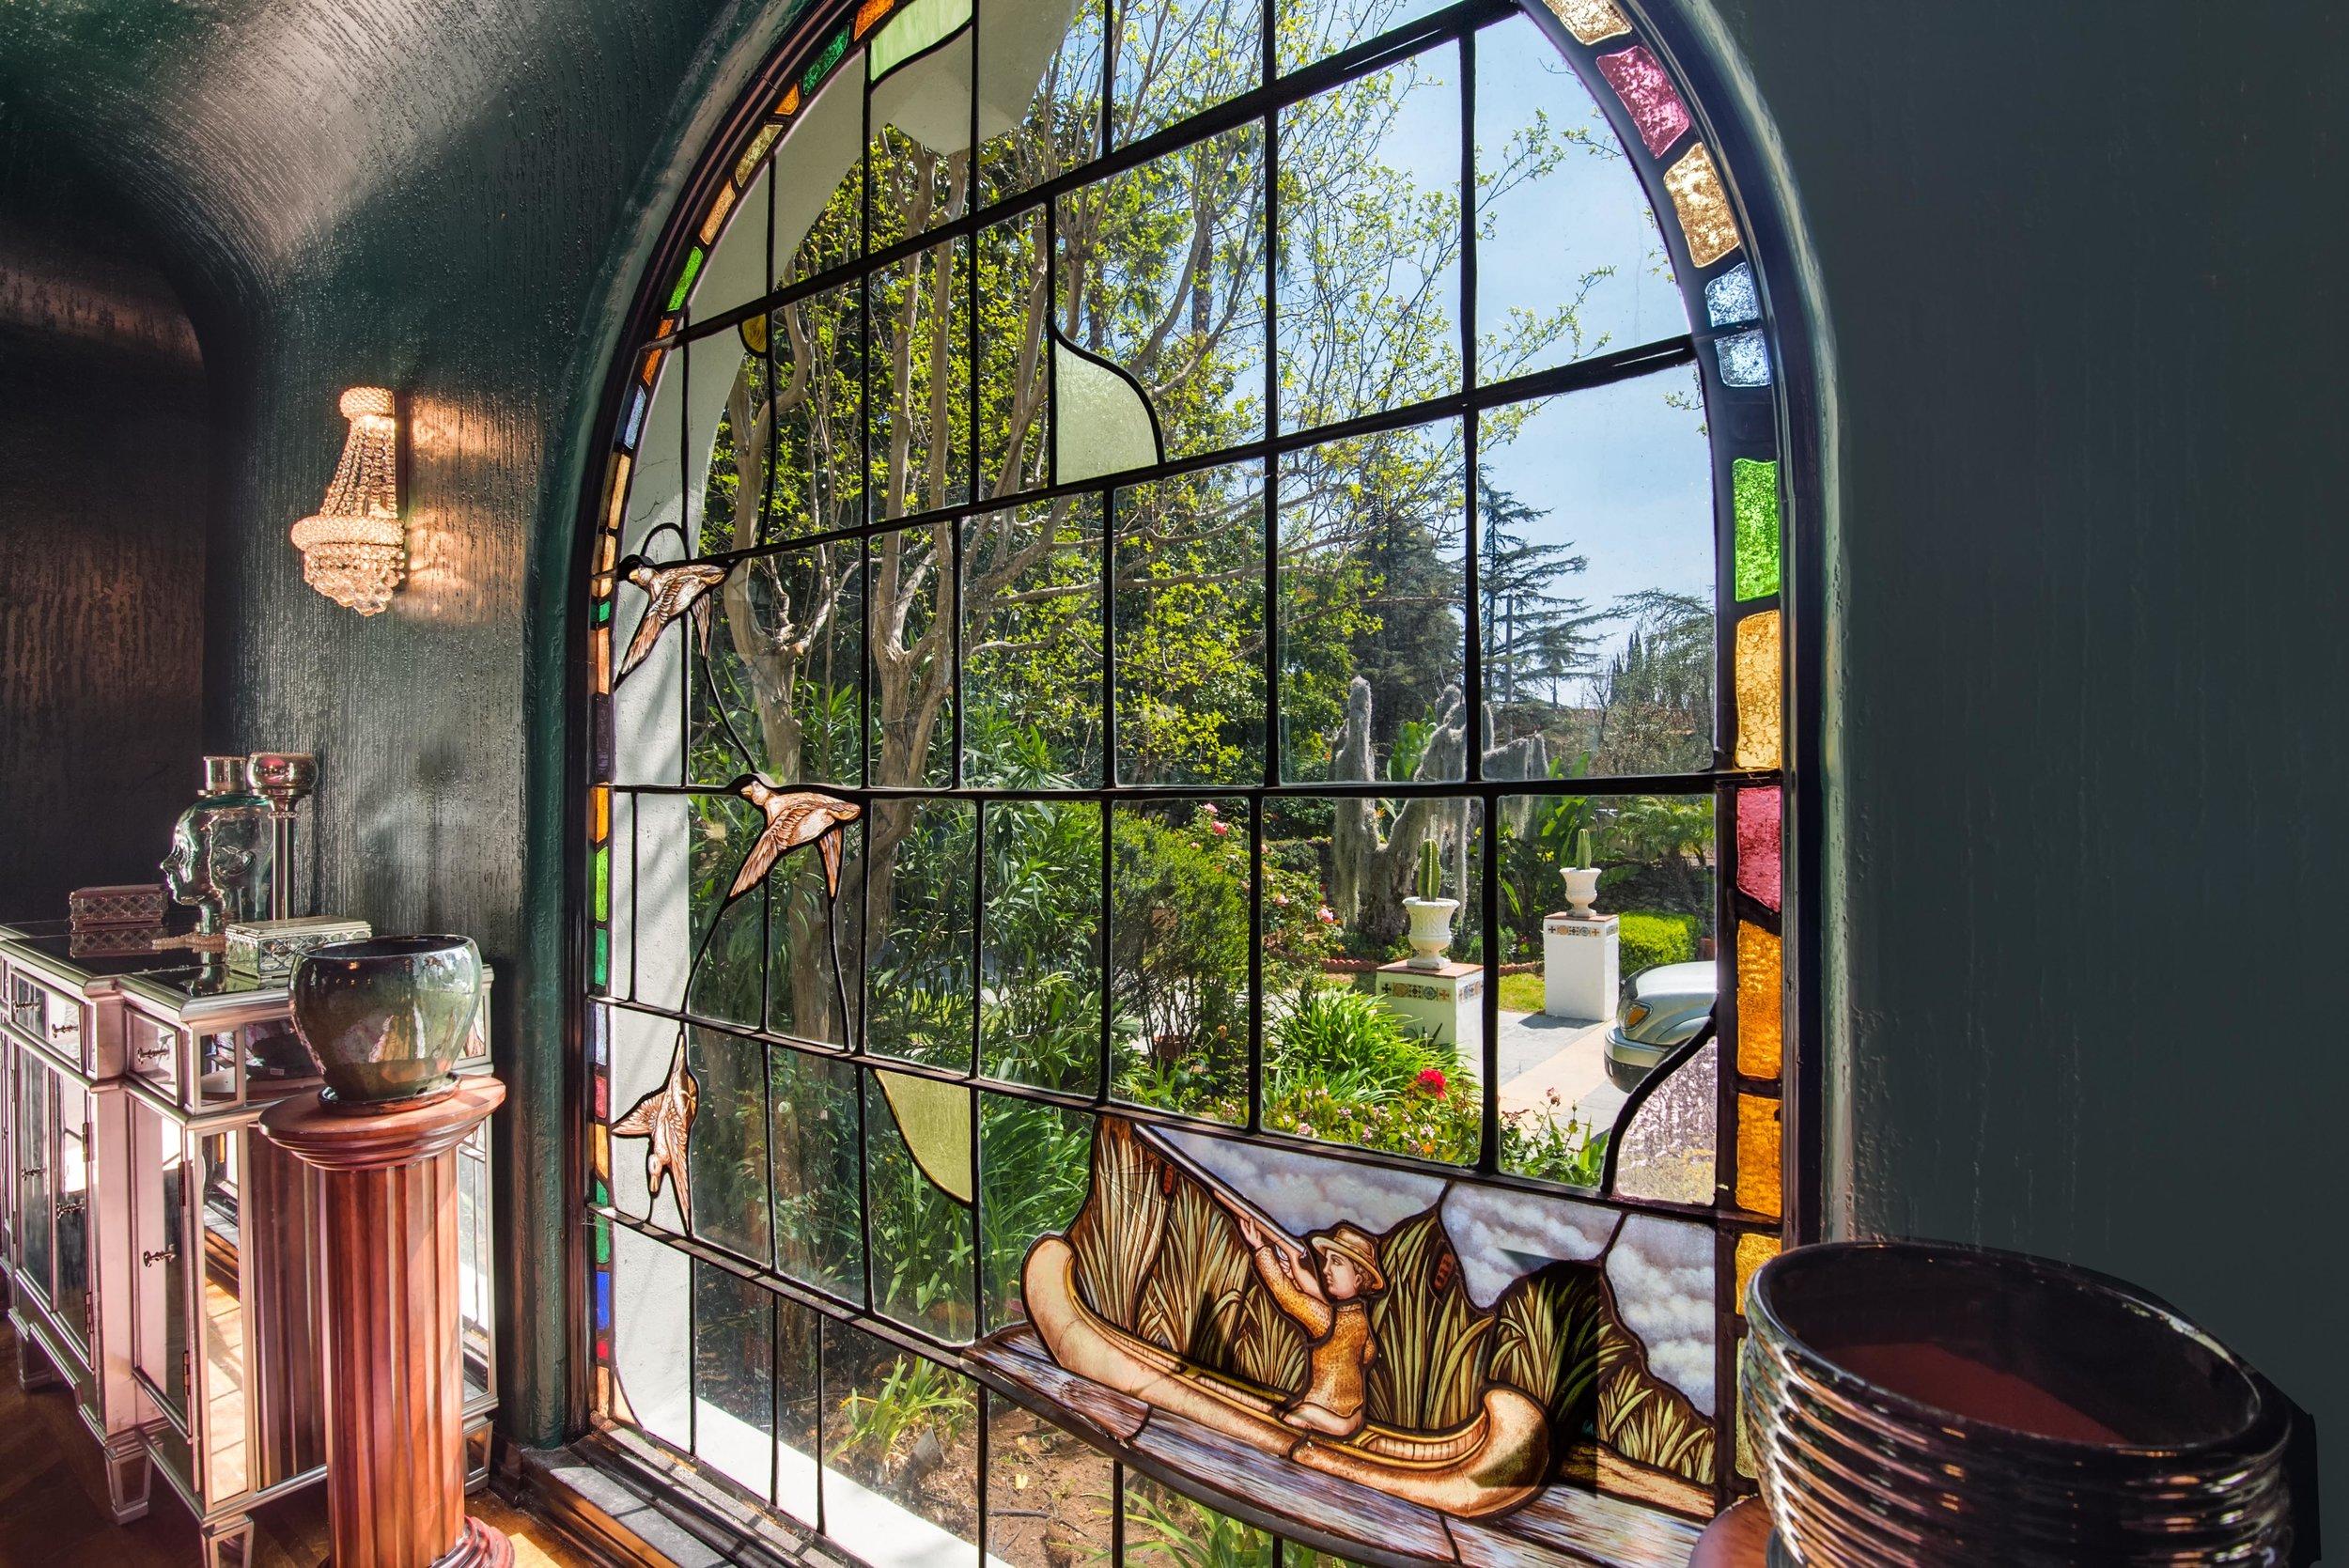 021 Window 006 Pool 4915 Los Feliz For Sale Los Angeles Lease The Malibu Life Team Luxury Real Estate.jpg